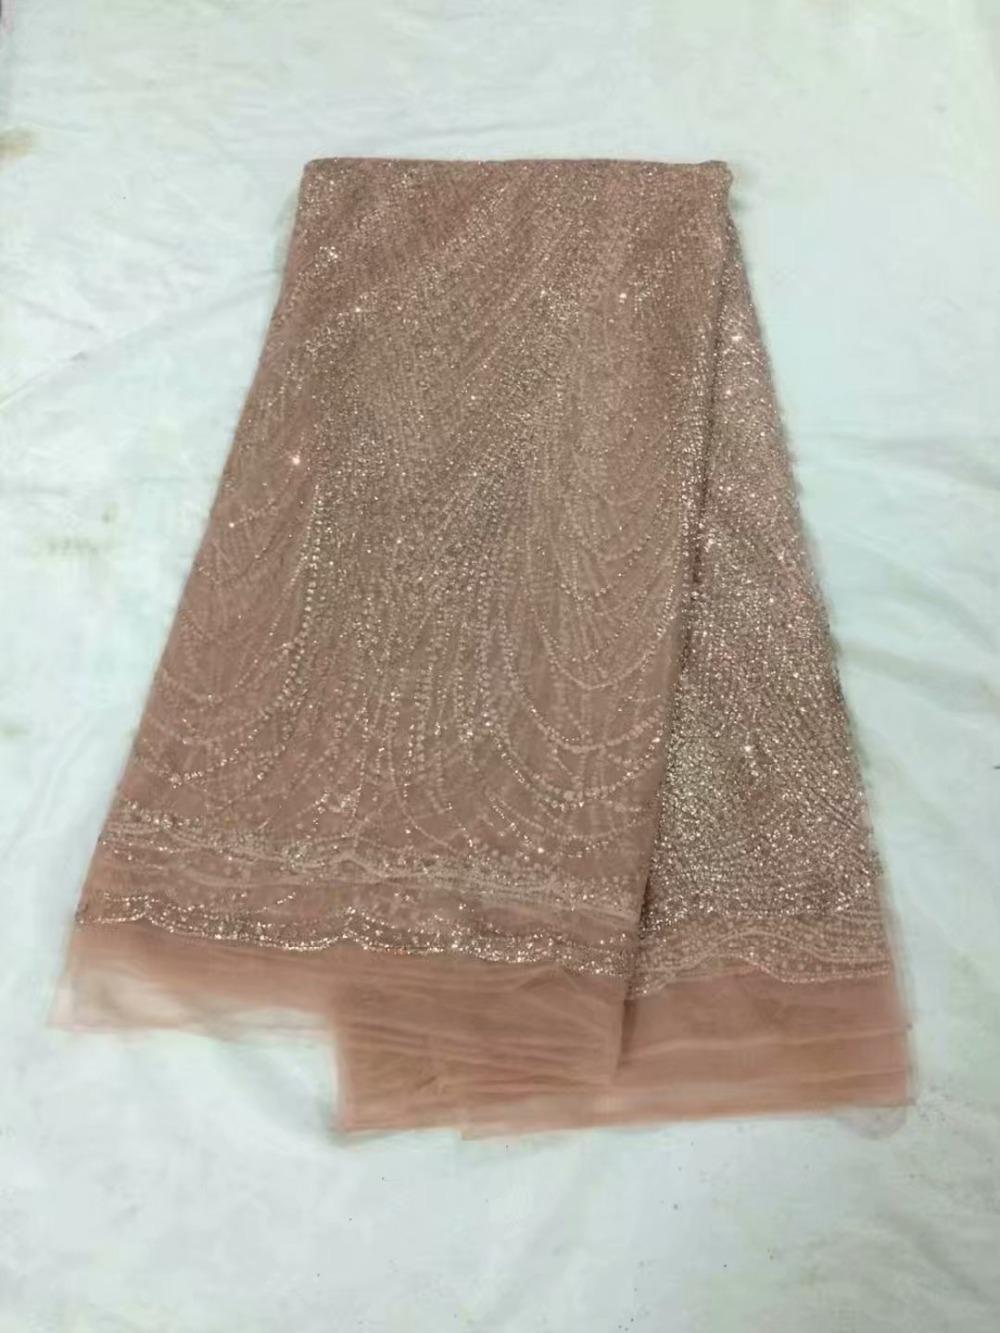 design elegante ouro rosa com glitter laço francês material de tule tecido de renda líquida para costurar o vestido UN46 (5yards / pc)